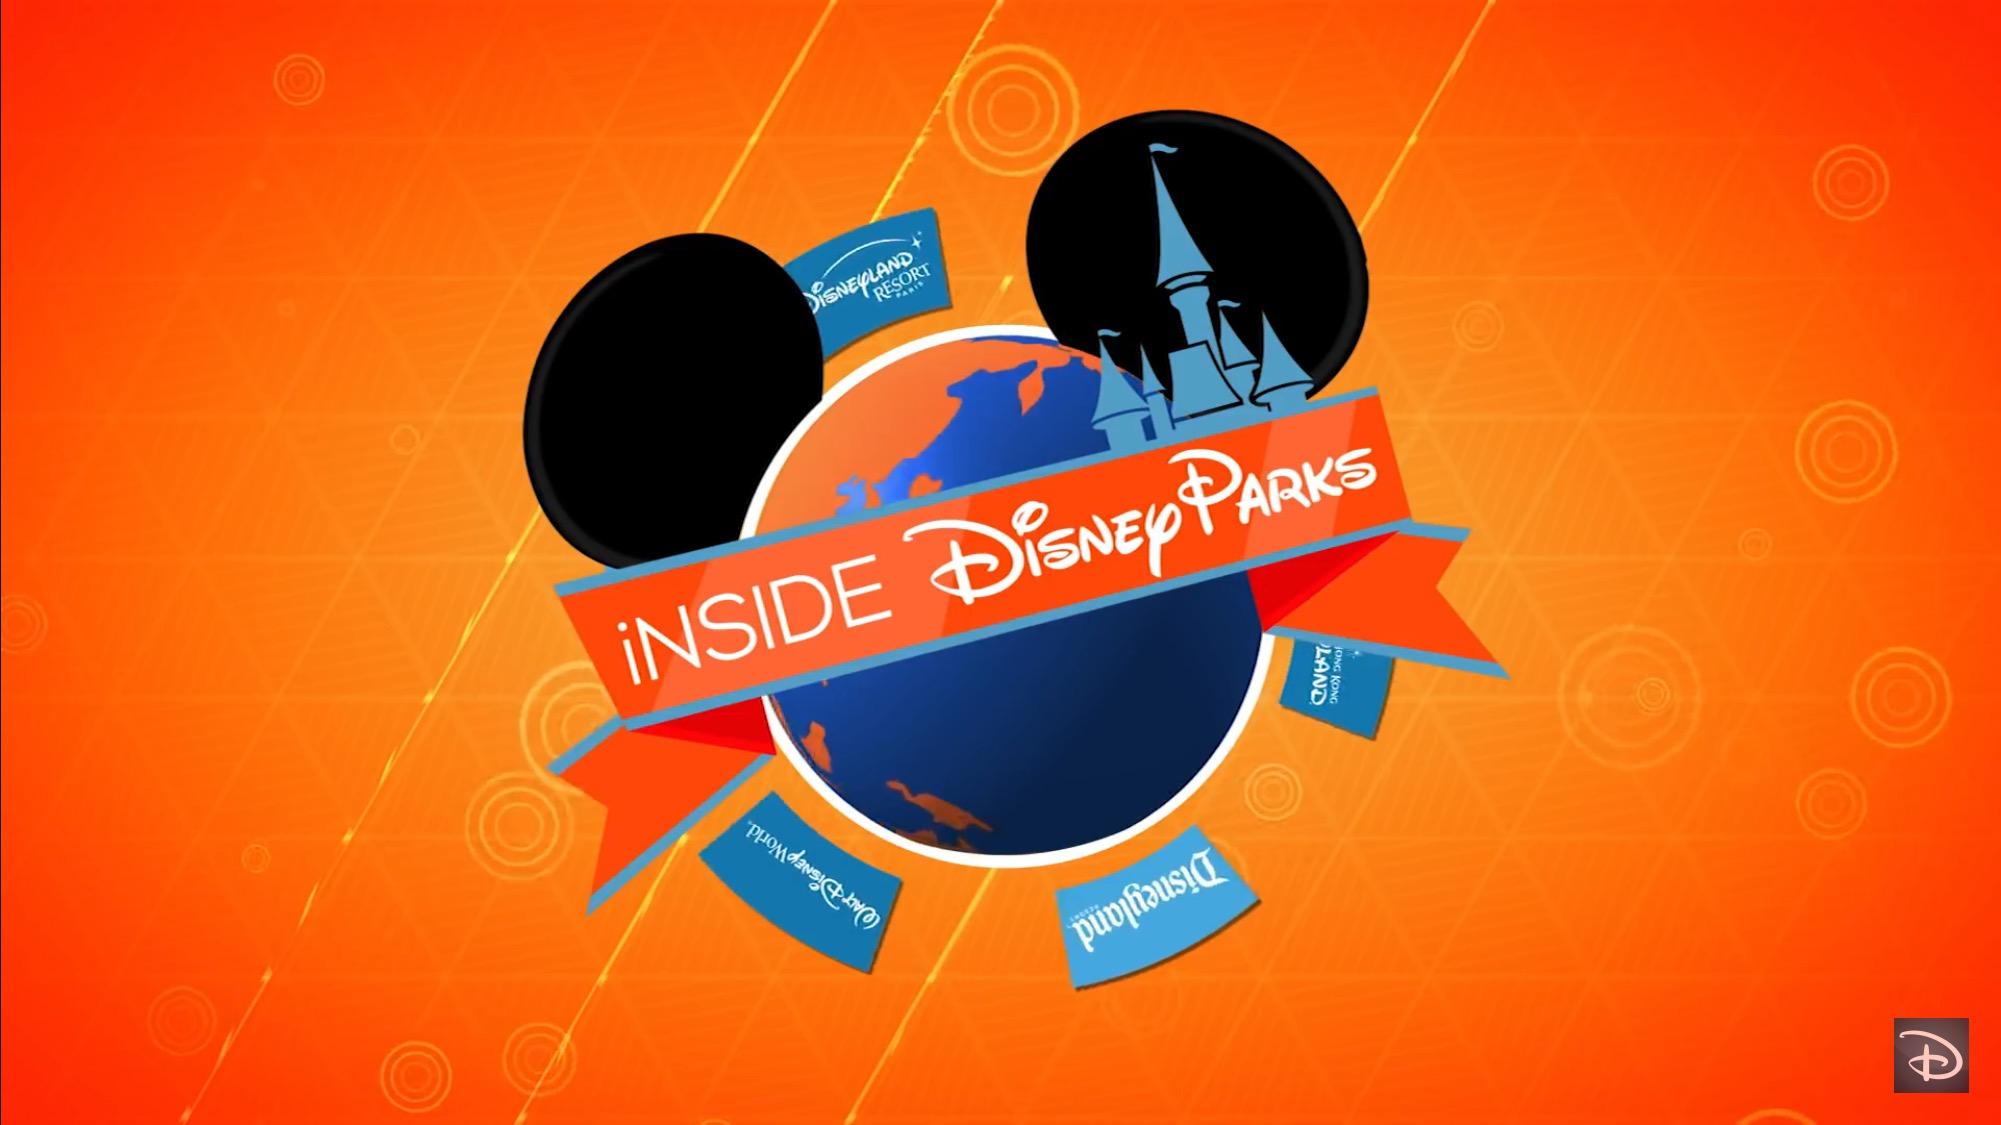 Inside Disney Parks - Episodio 1 | @yosoymamipr